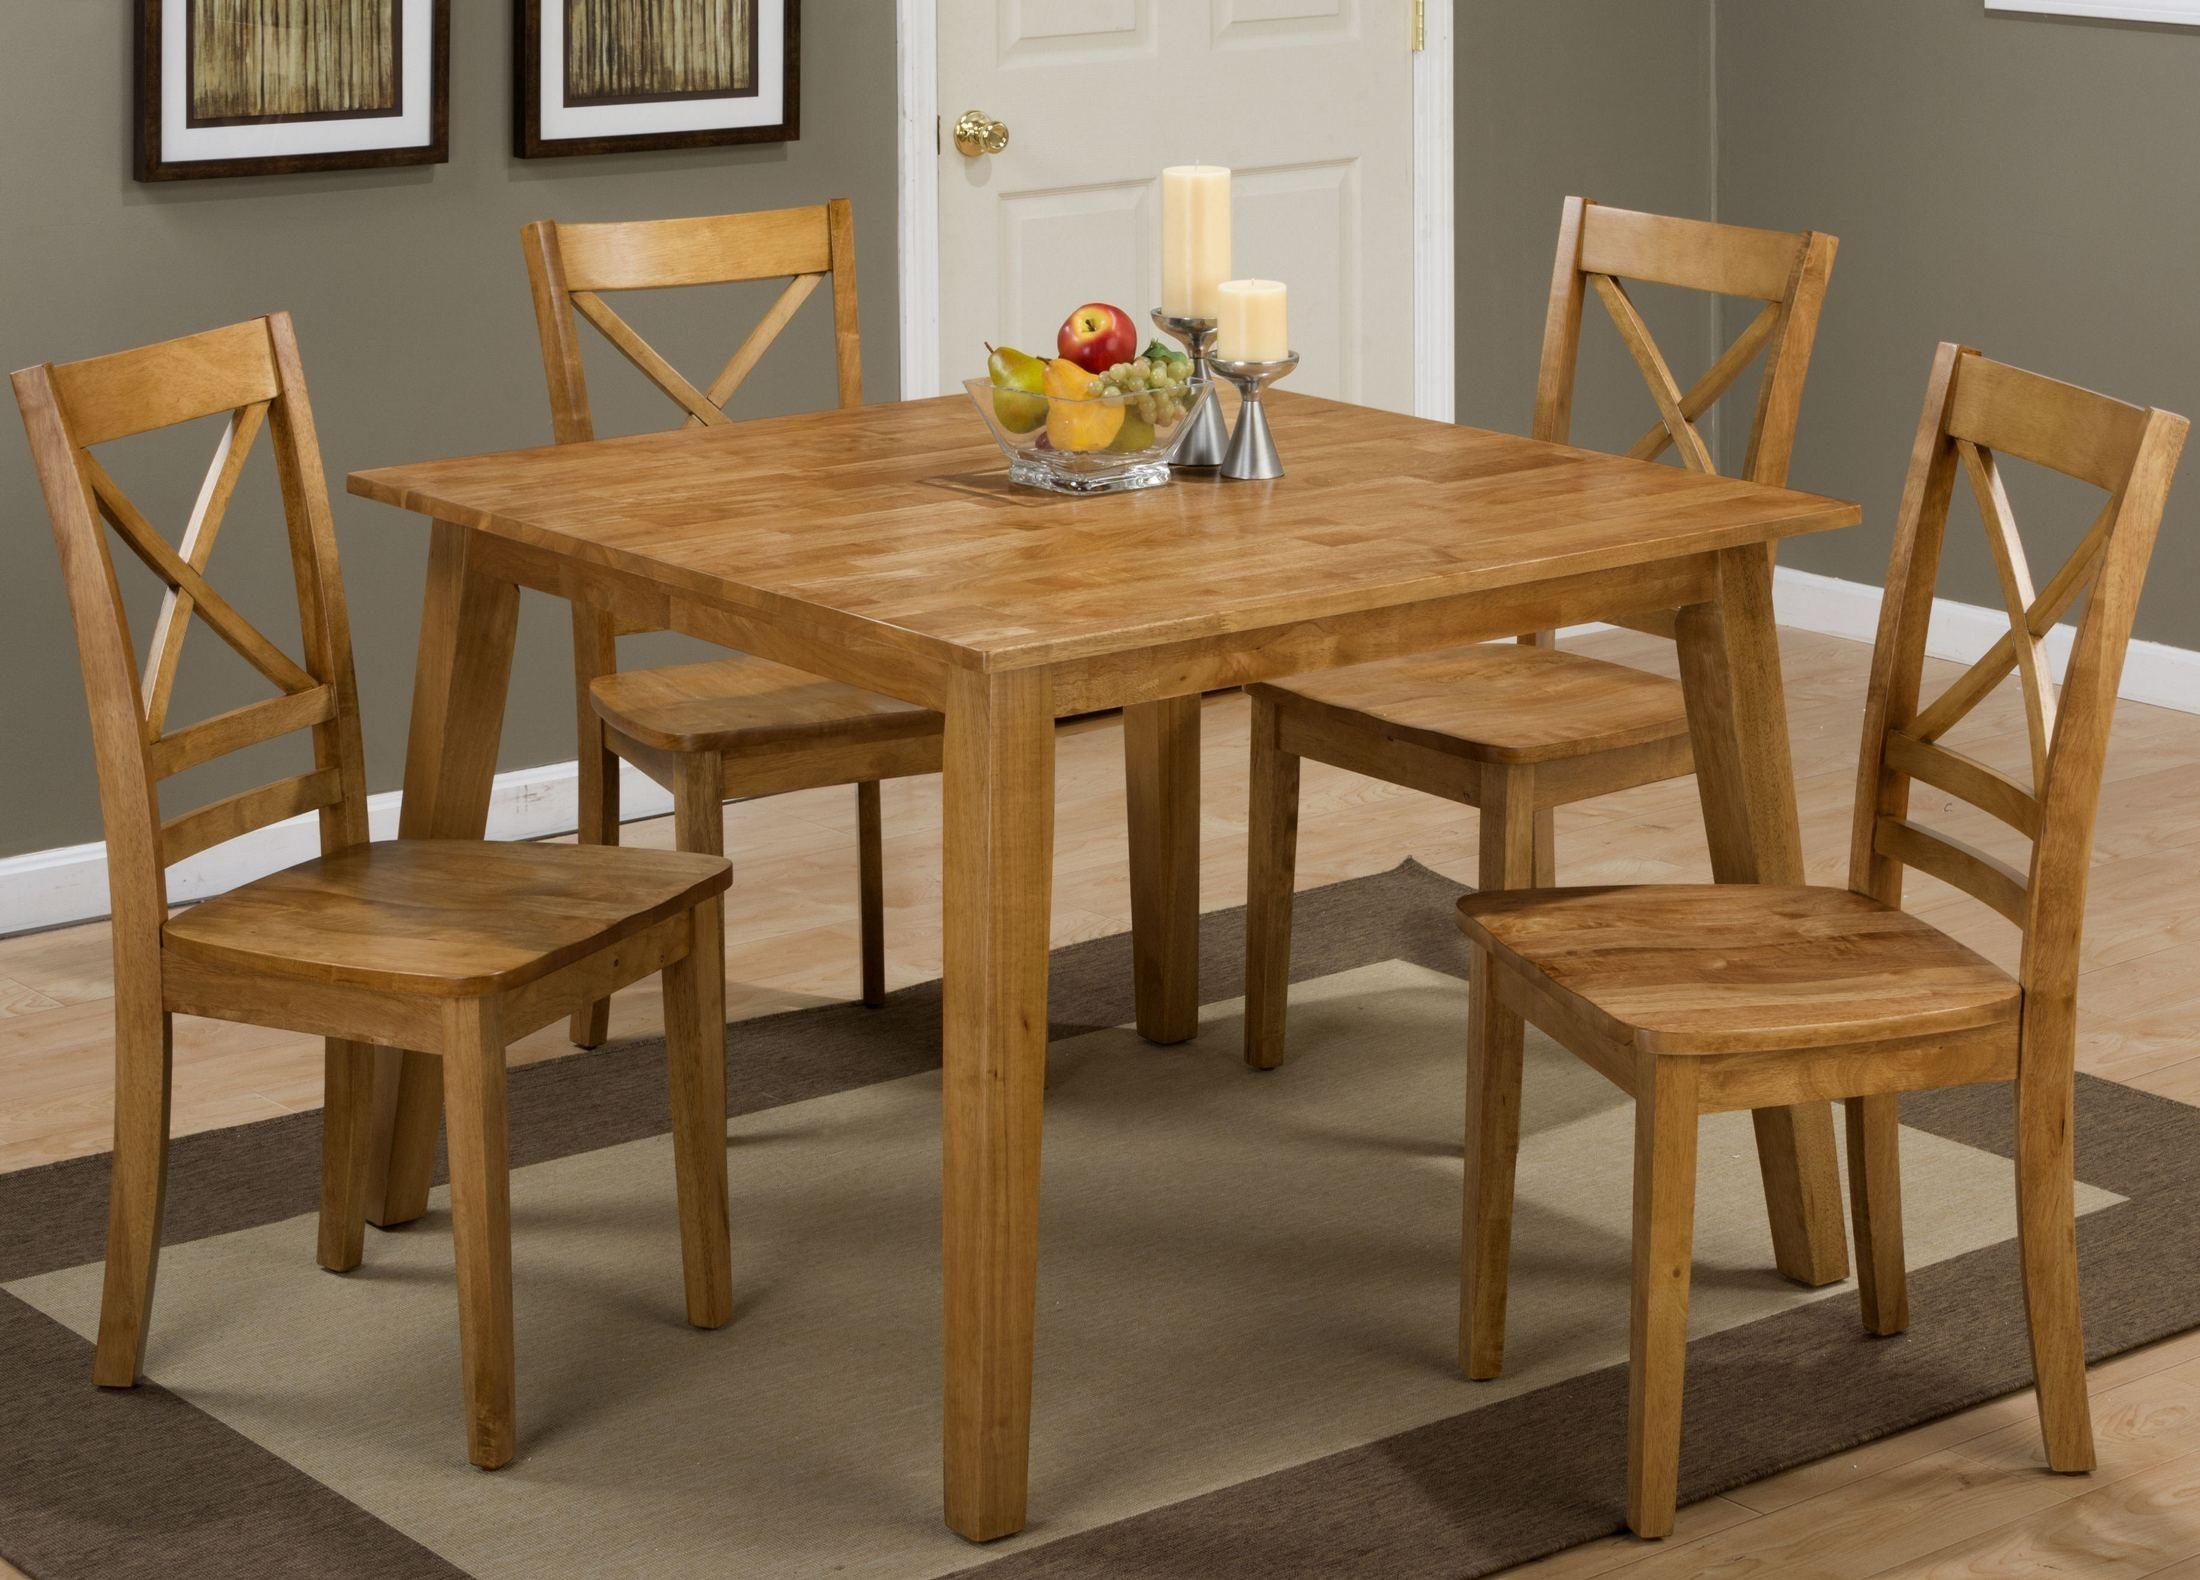 simplicity honey square dining room set 352 42 jofran theo square dining room set from ashley d158 225